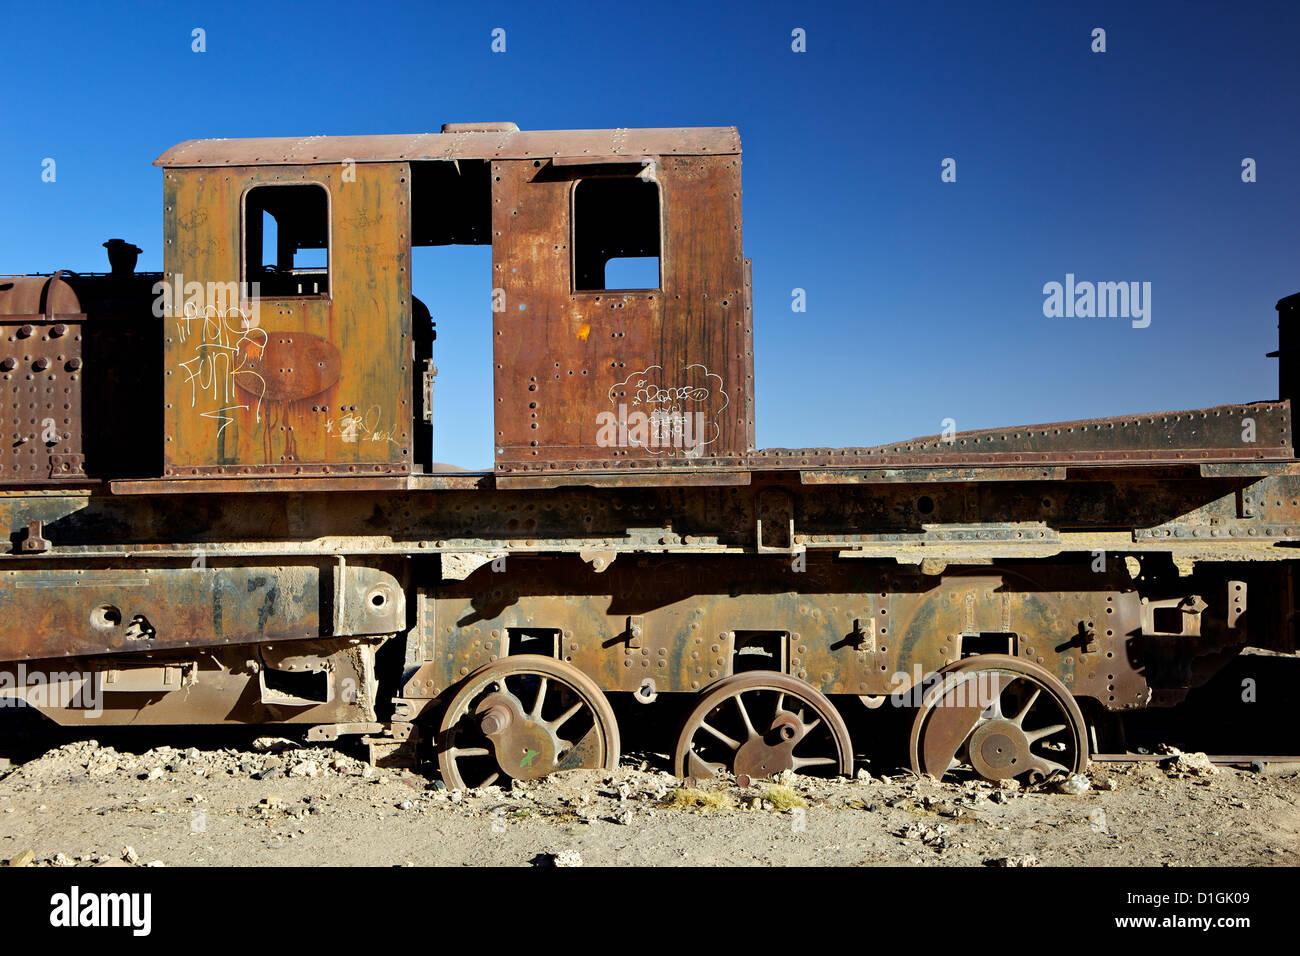 Rusting old steam locomotives at the Train cemetery (train graveyard), Uyuni, Southwest, Bolivia, South America - Stock Image